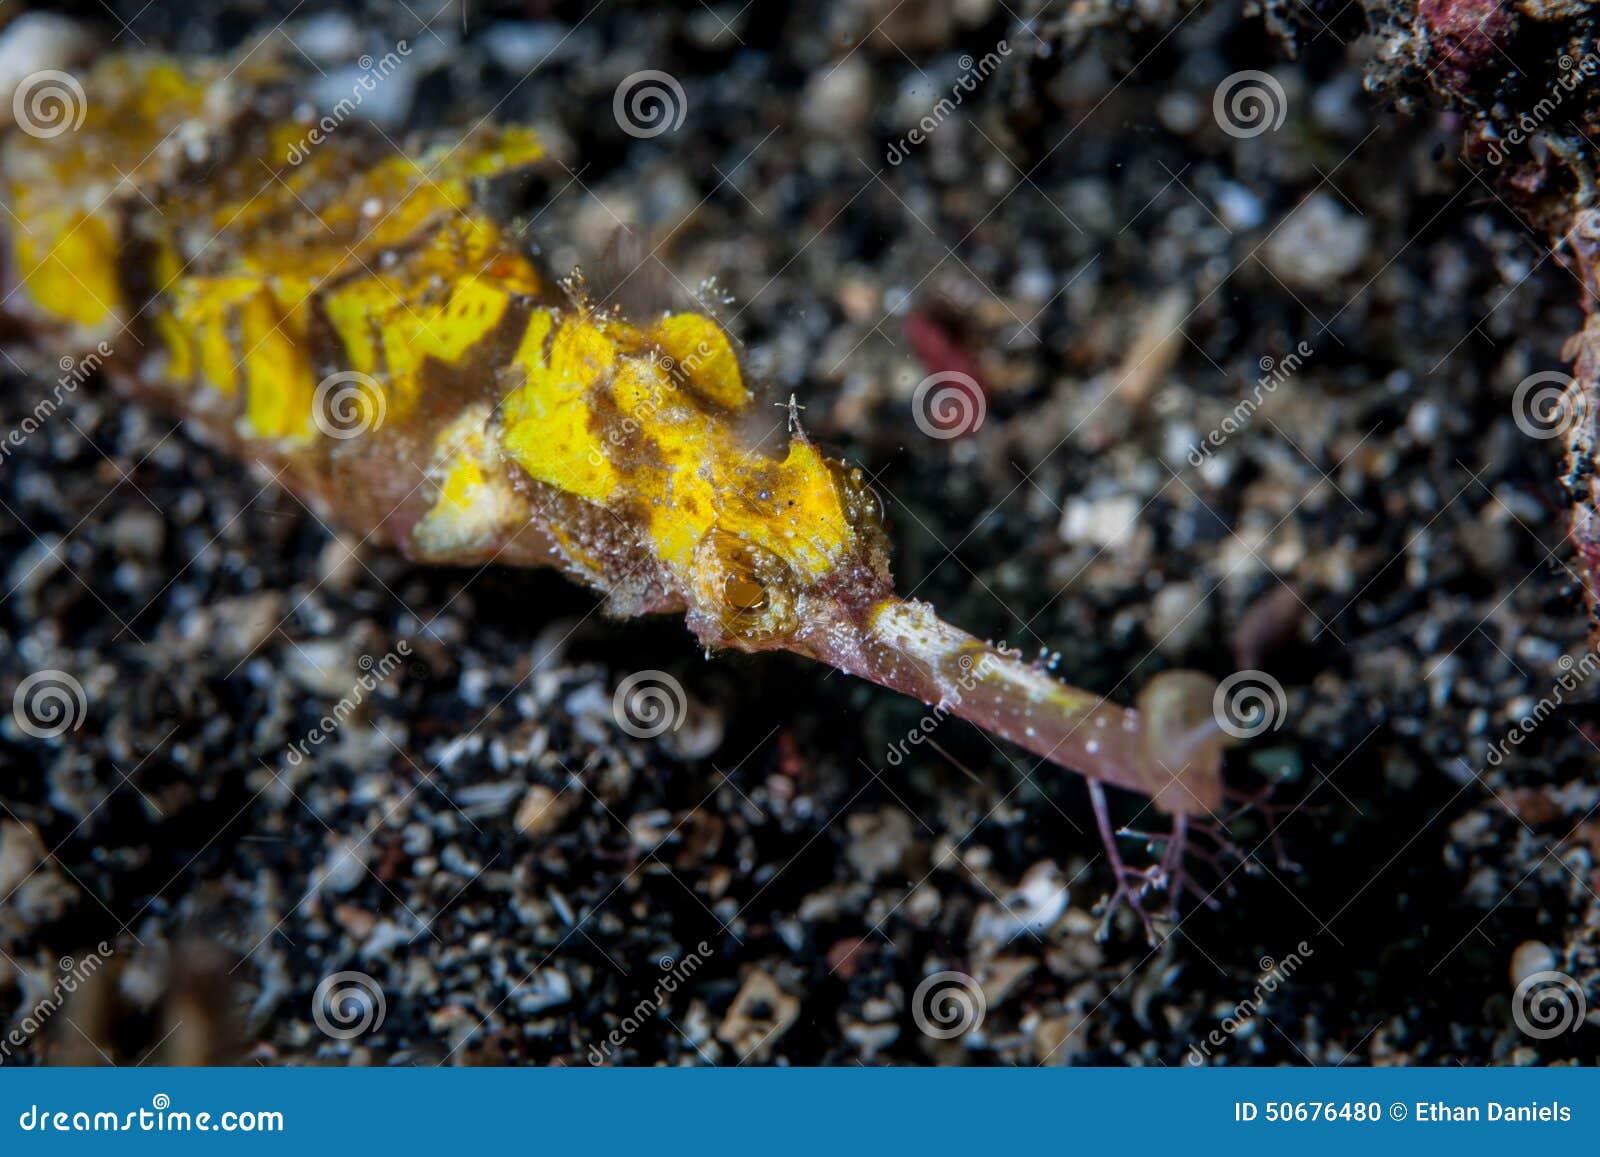 Download 飞过的杨枝鱼 库存照片. 图片 包括有 伪装, 操作的, 本质, 酸度, 海洋, 演变, 生态, ,并且 - 50676480